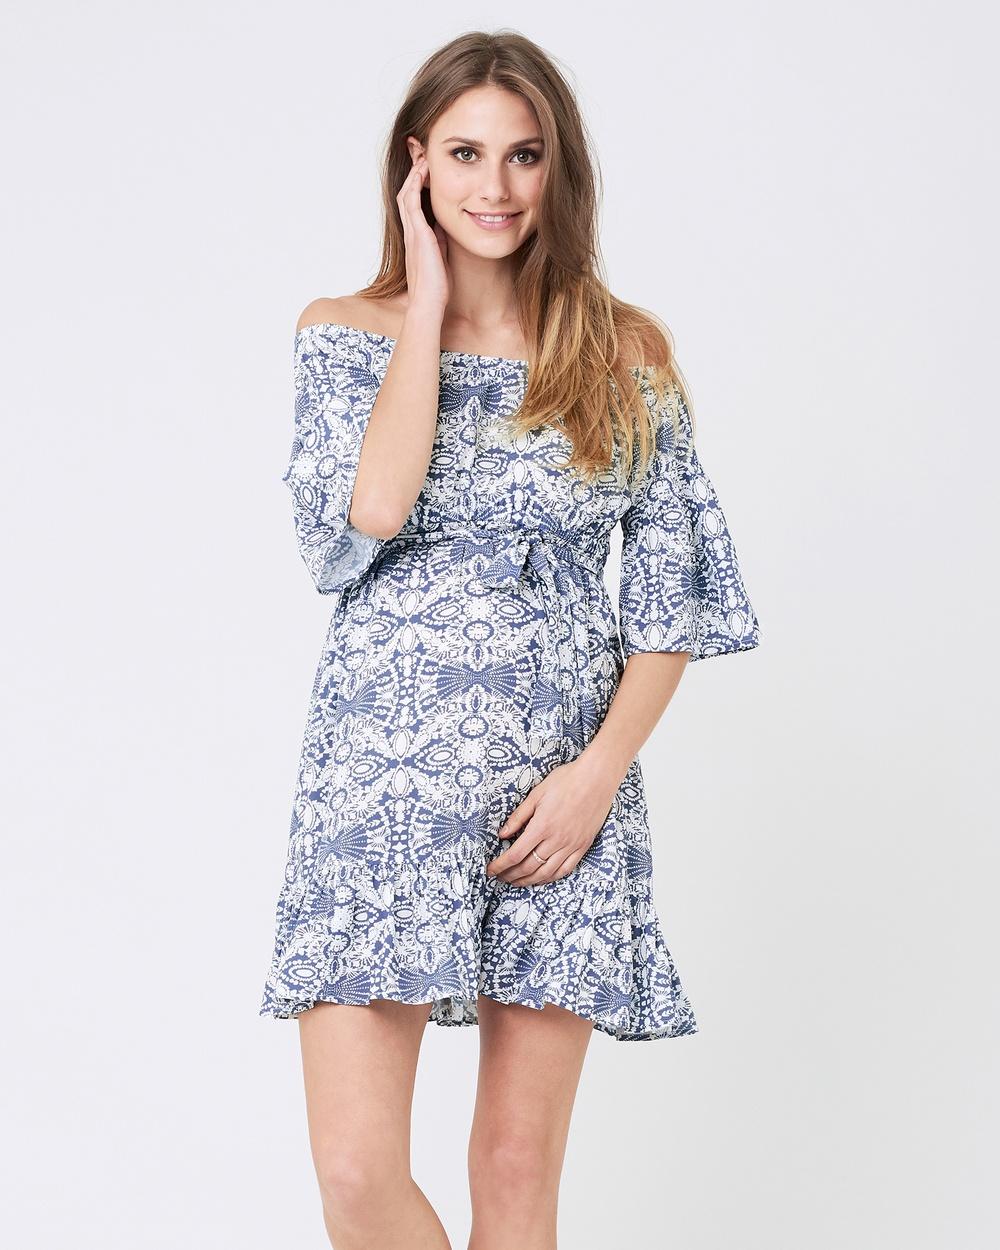 Ripe Maternity Ella Cold Shoulder Frill Dress Printed Dresses Grey-White Ella Cold Shoulder Frill Dress